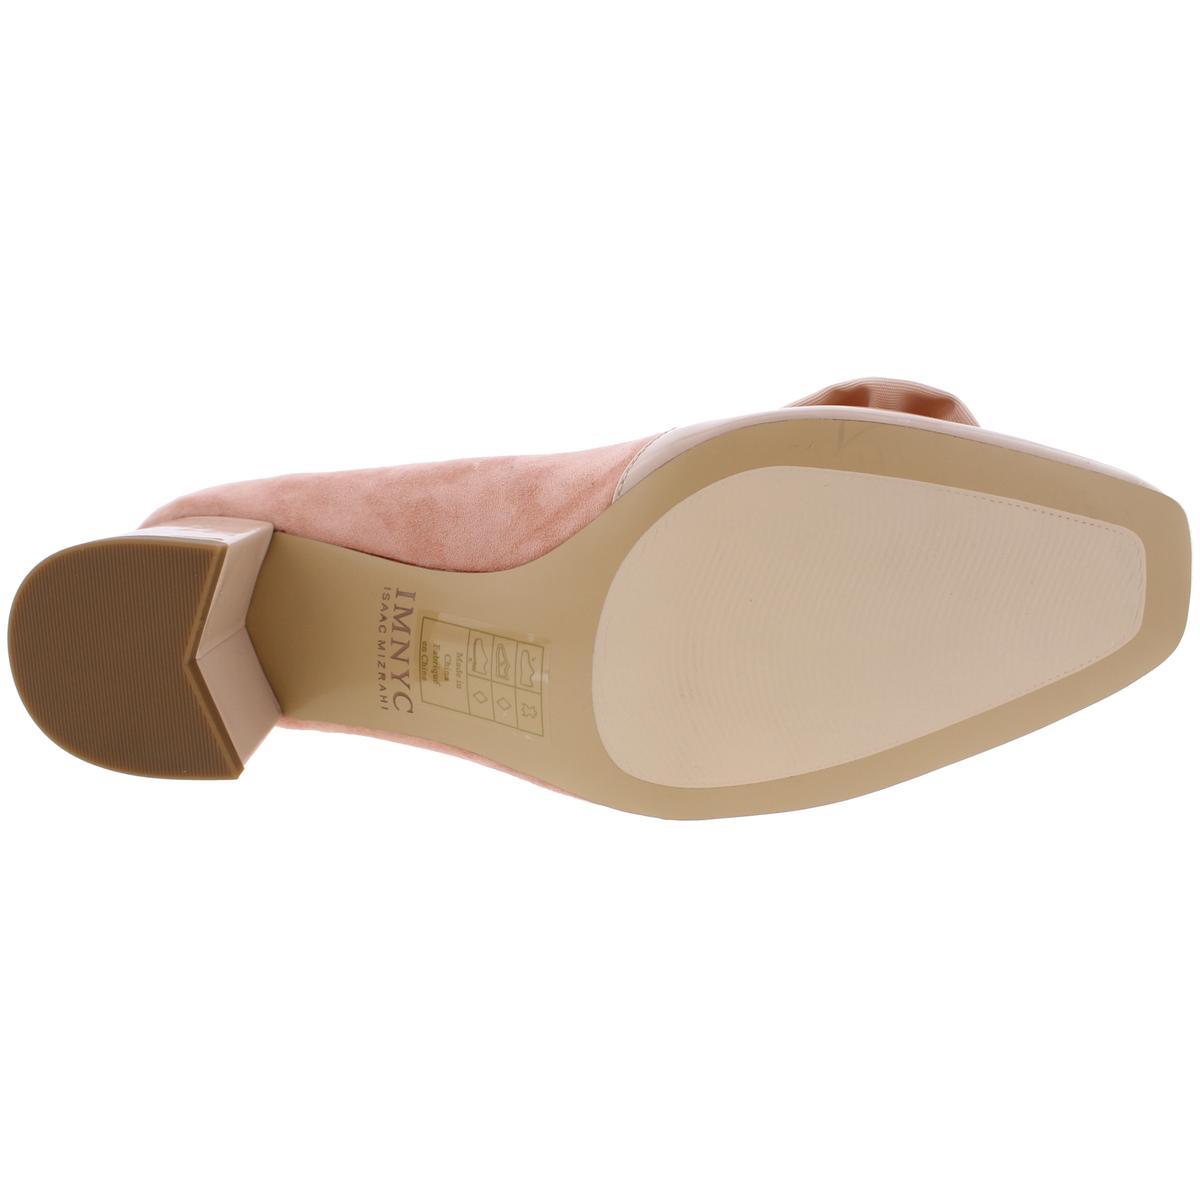 IMNYC-Isaac-Mizrahi-Womens-Julia-Square-Toe-Suede-Dress-Pumps-Shoes-BHFO-2614 thumbnail 8